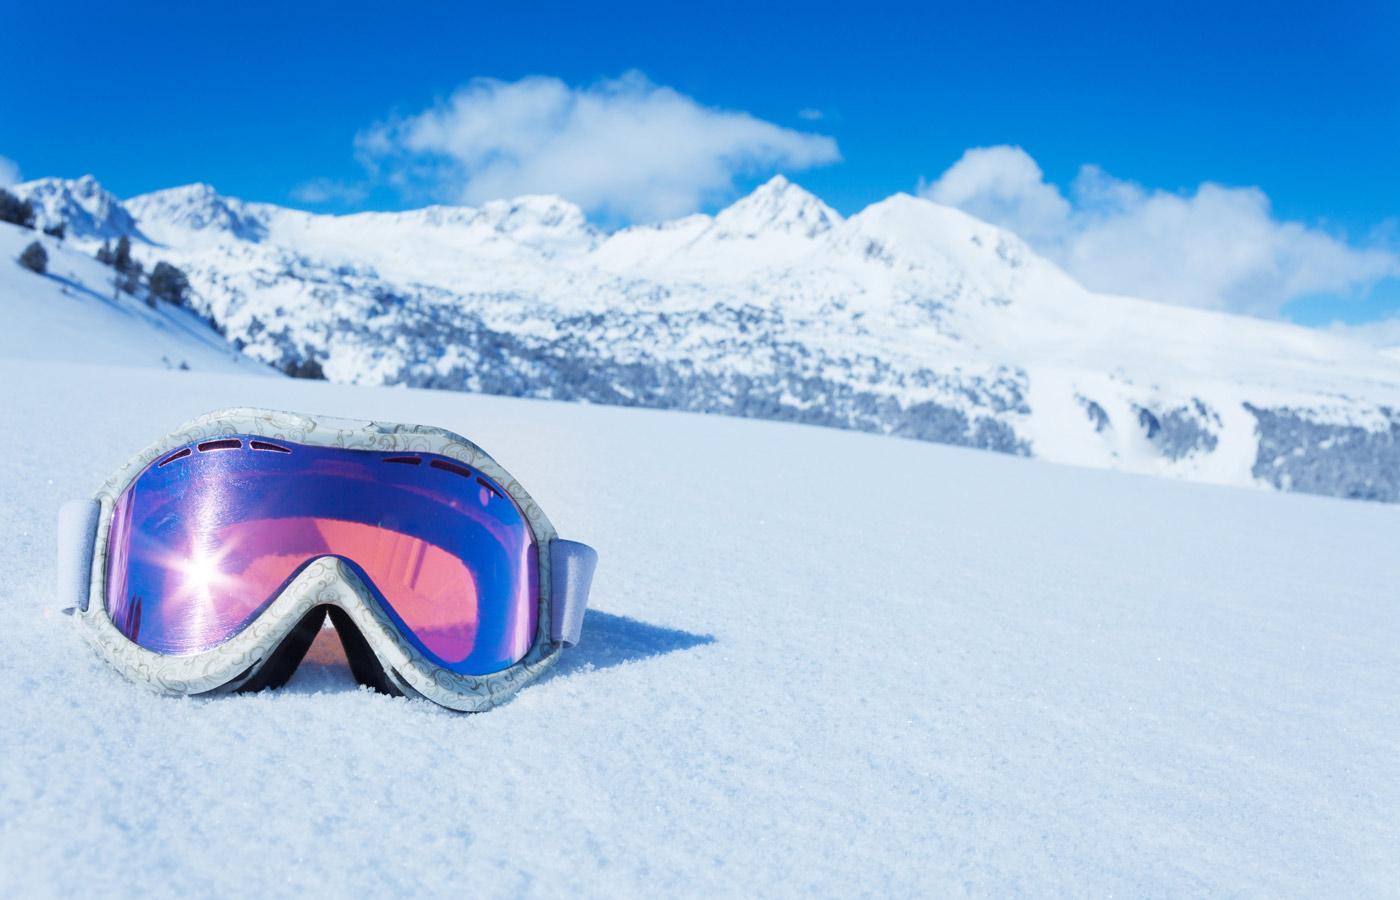 gafas esqui nieve